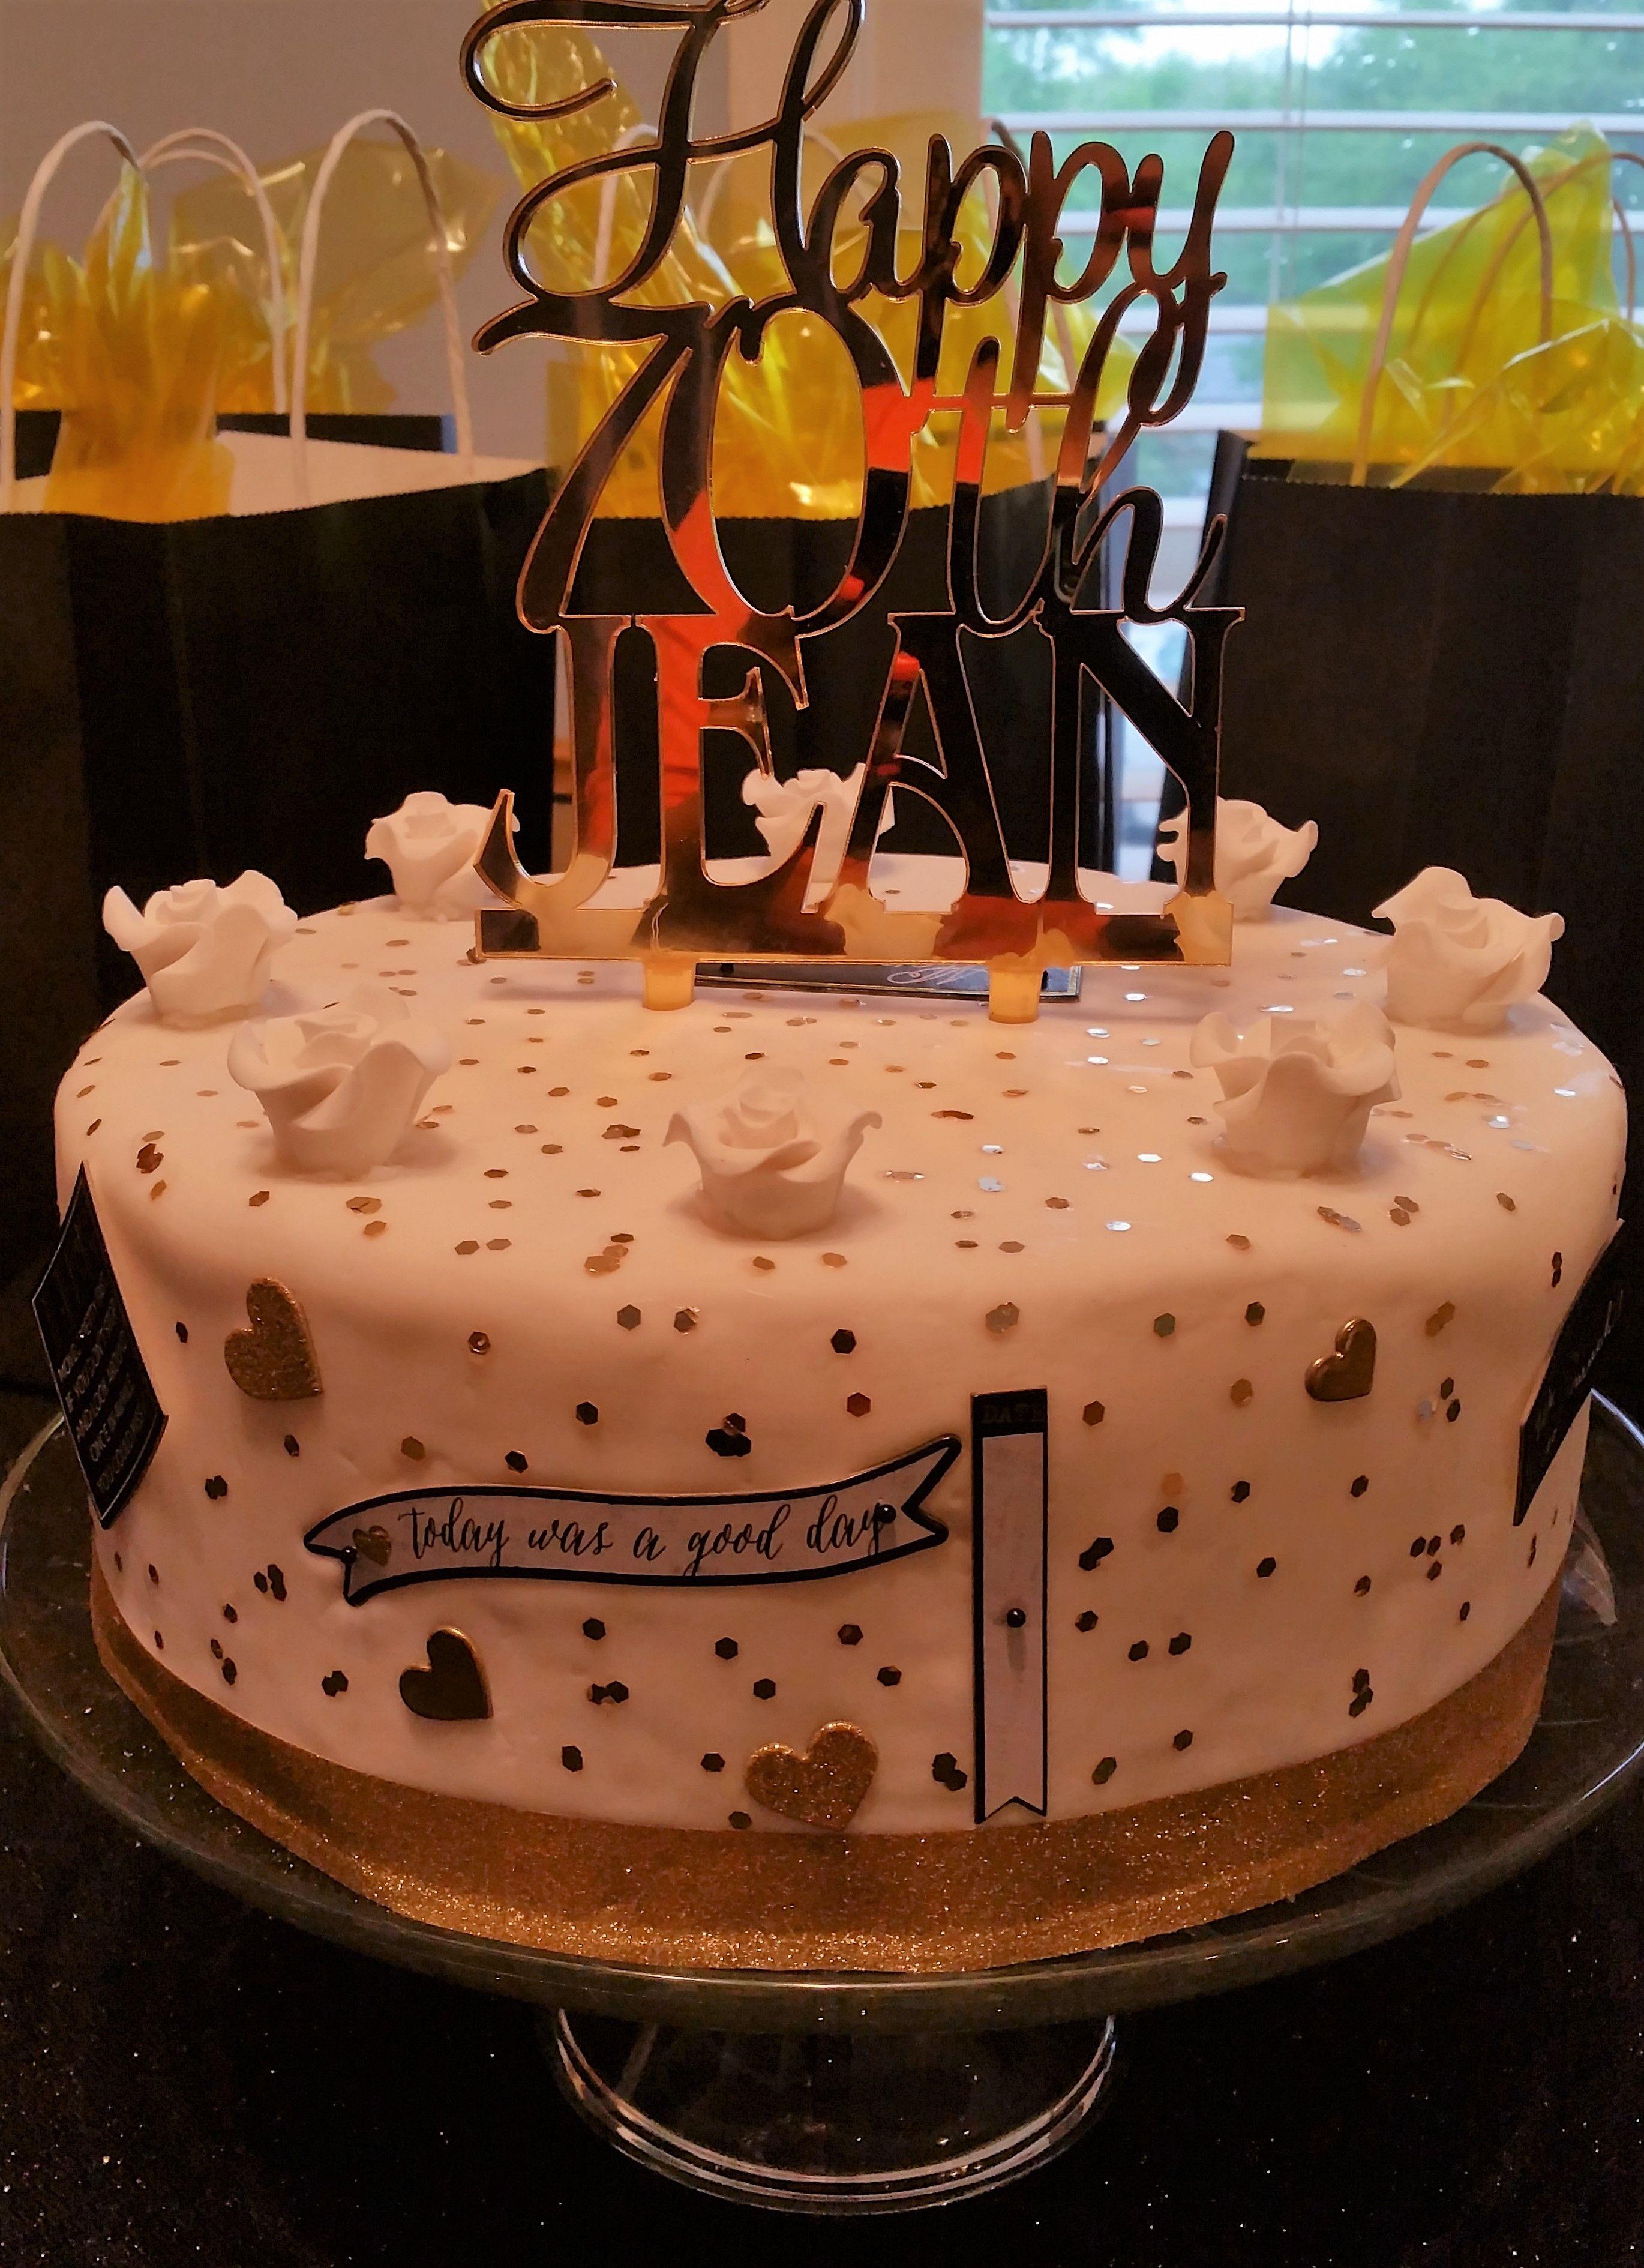 Candle Sweetie Designer Cake 70th Birthday